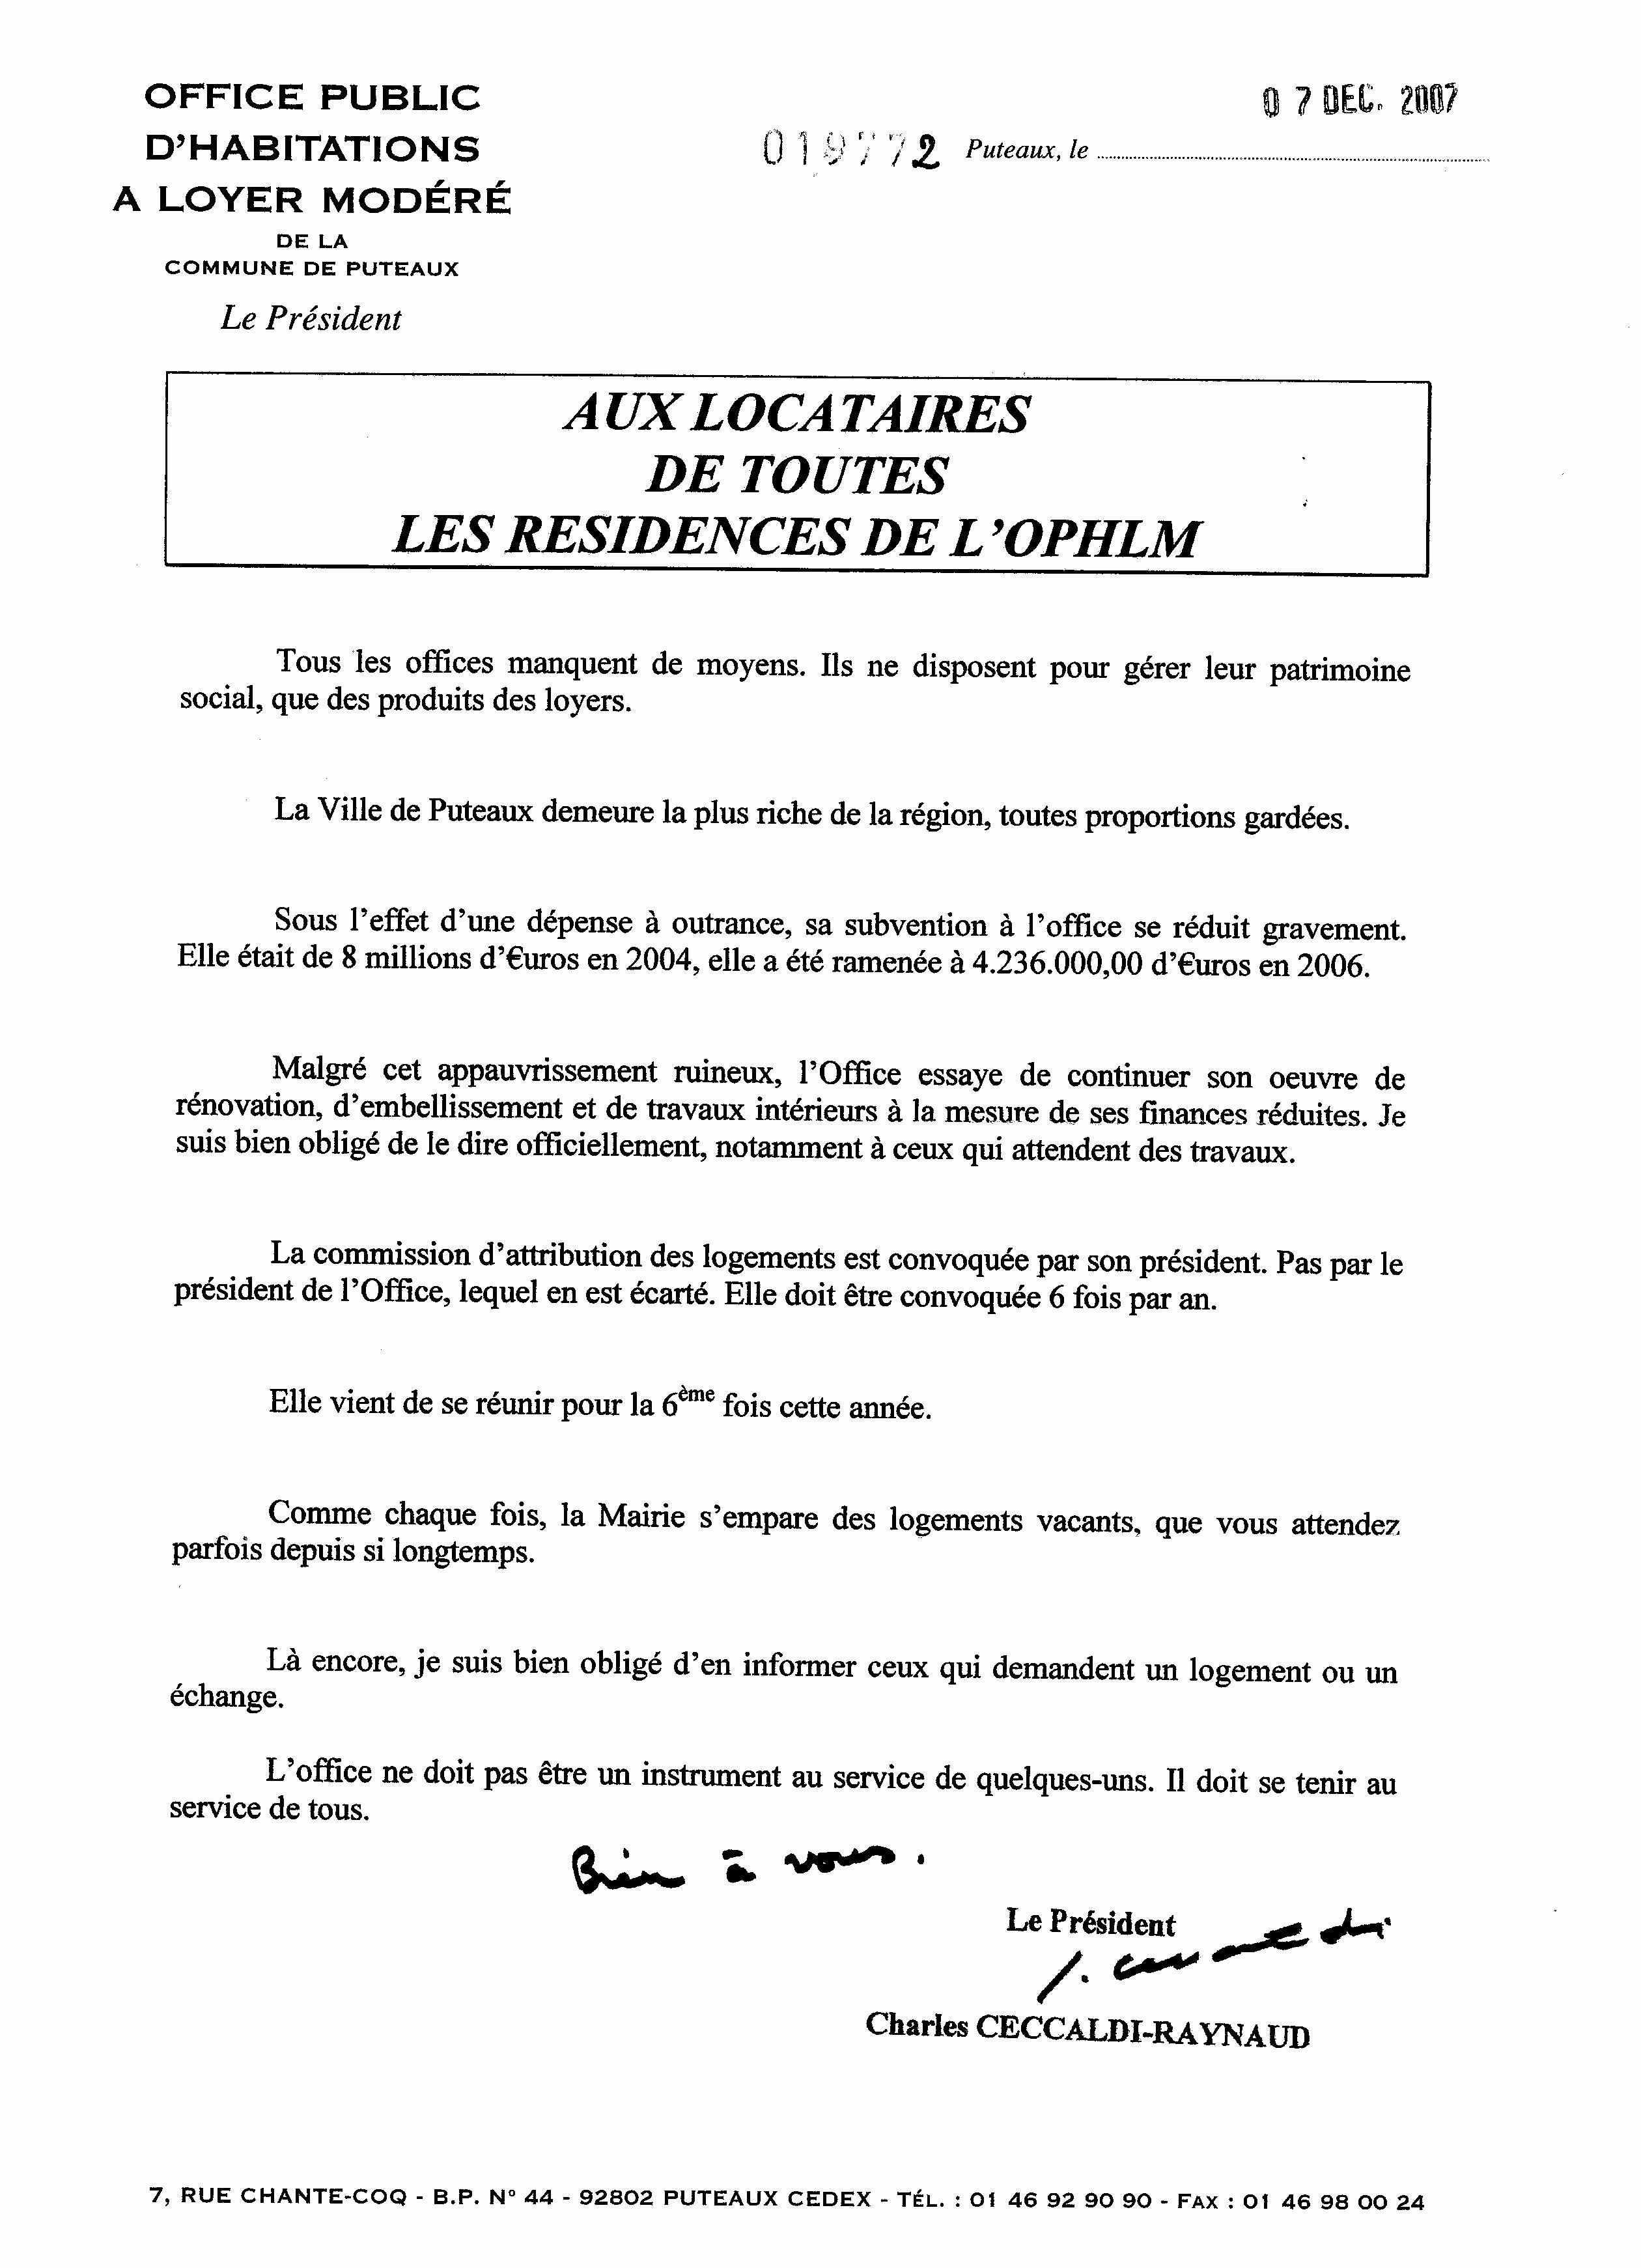 Nadine Jeanne Elue De Puteaux Ophlm 1 Charles Ceccaldi Raynaud